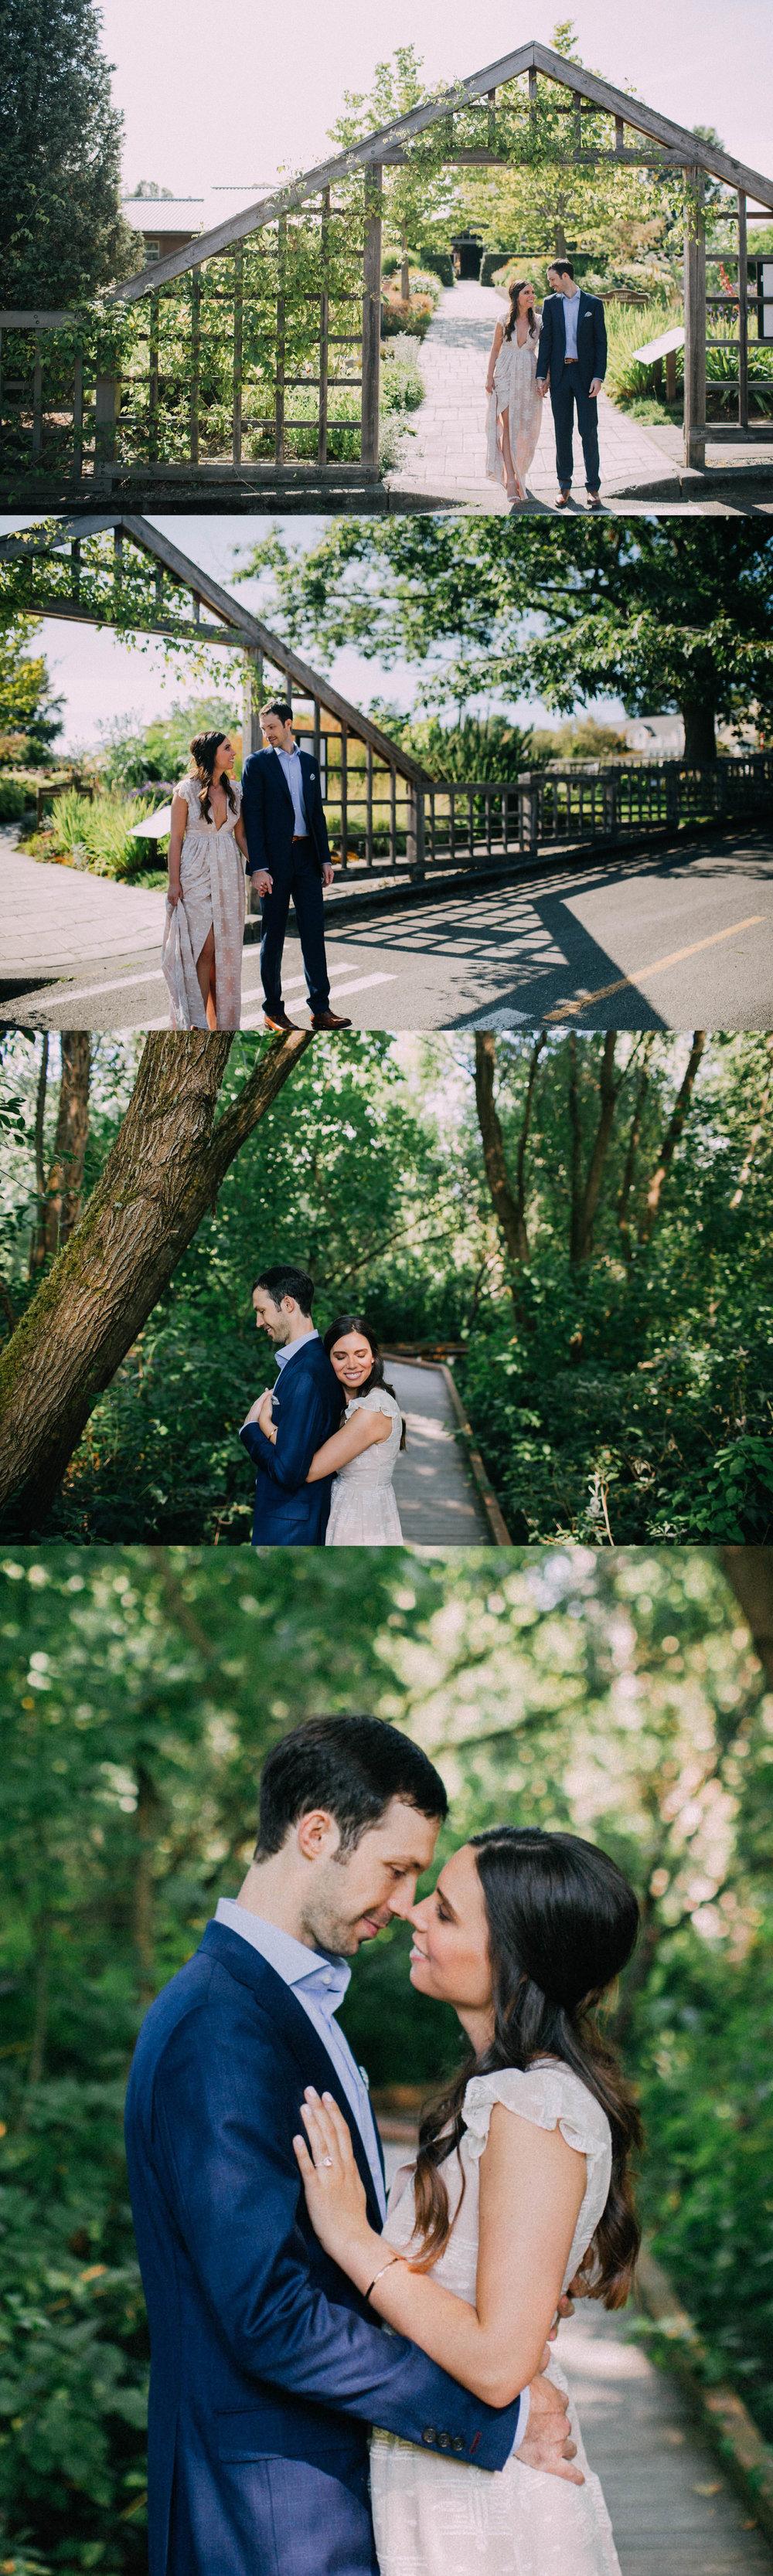 Seattle courthouse and wedding photographer ballard wedding ashley vos-15.jpg